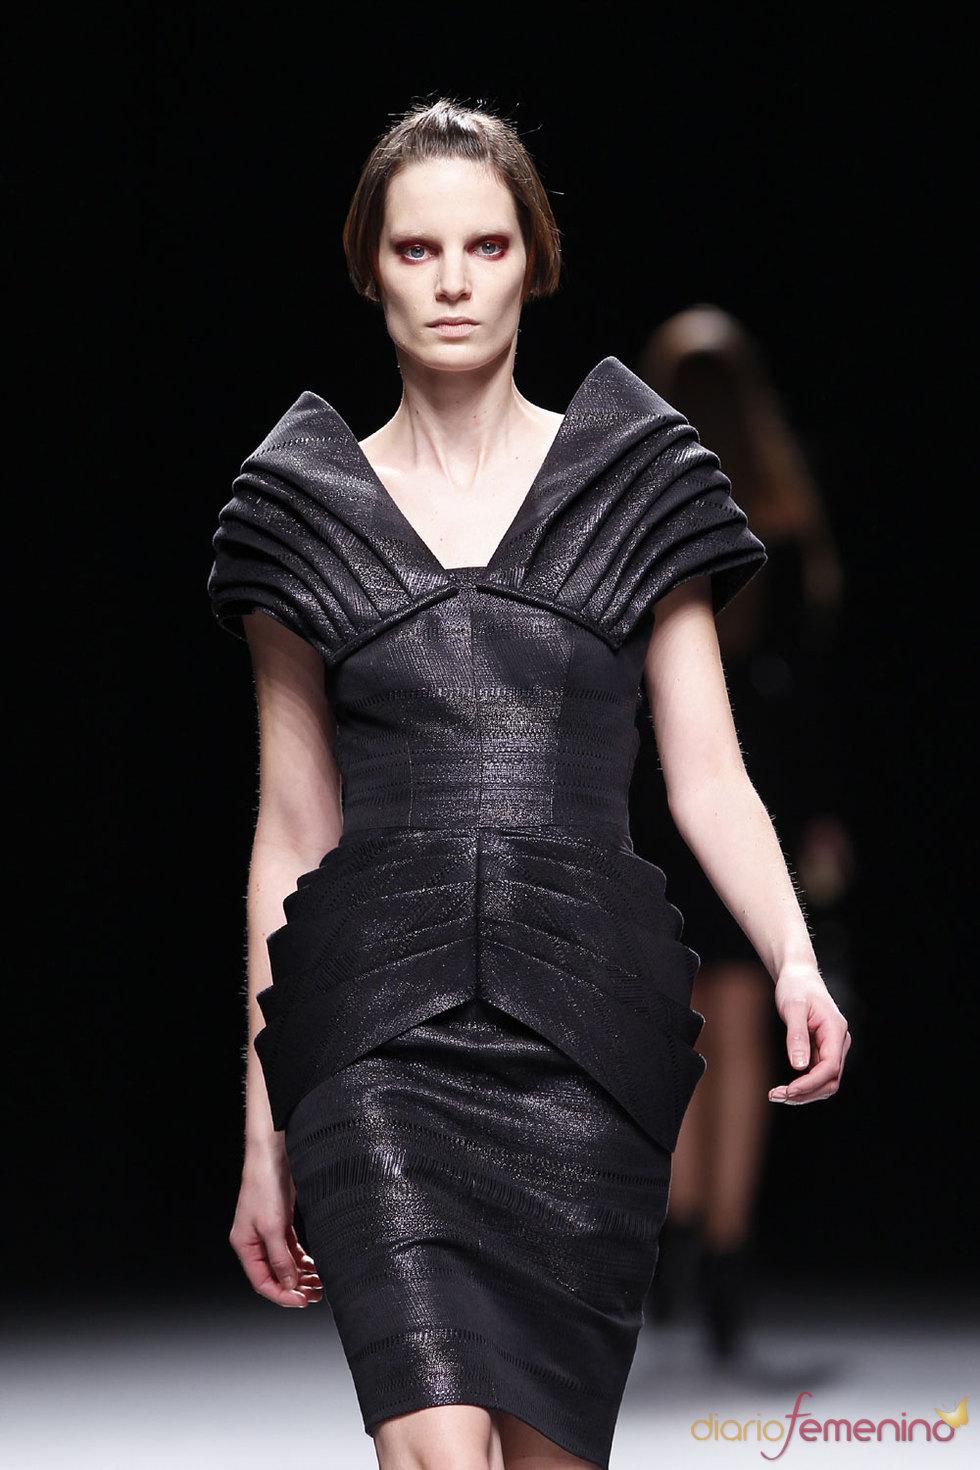 Vestido negro de Juanjo Oliva en Cibeles 2010